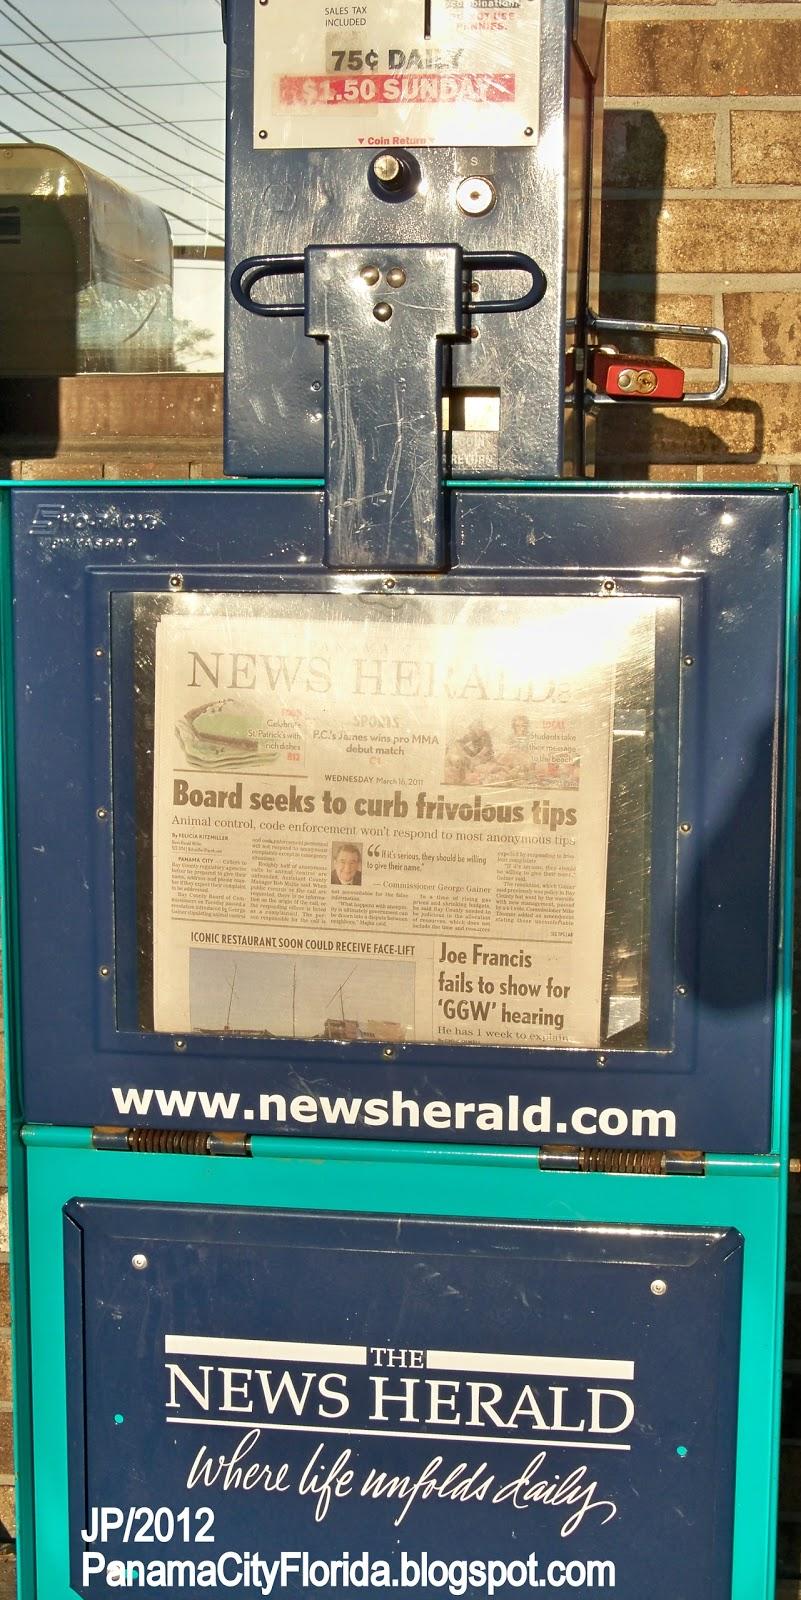 Newspaper panama city florida bay county fl news herald daily paper